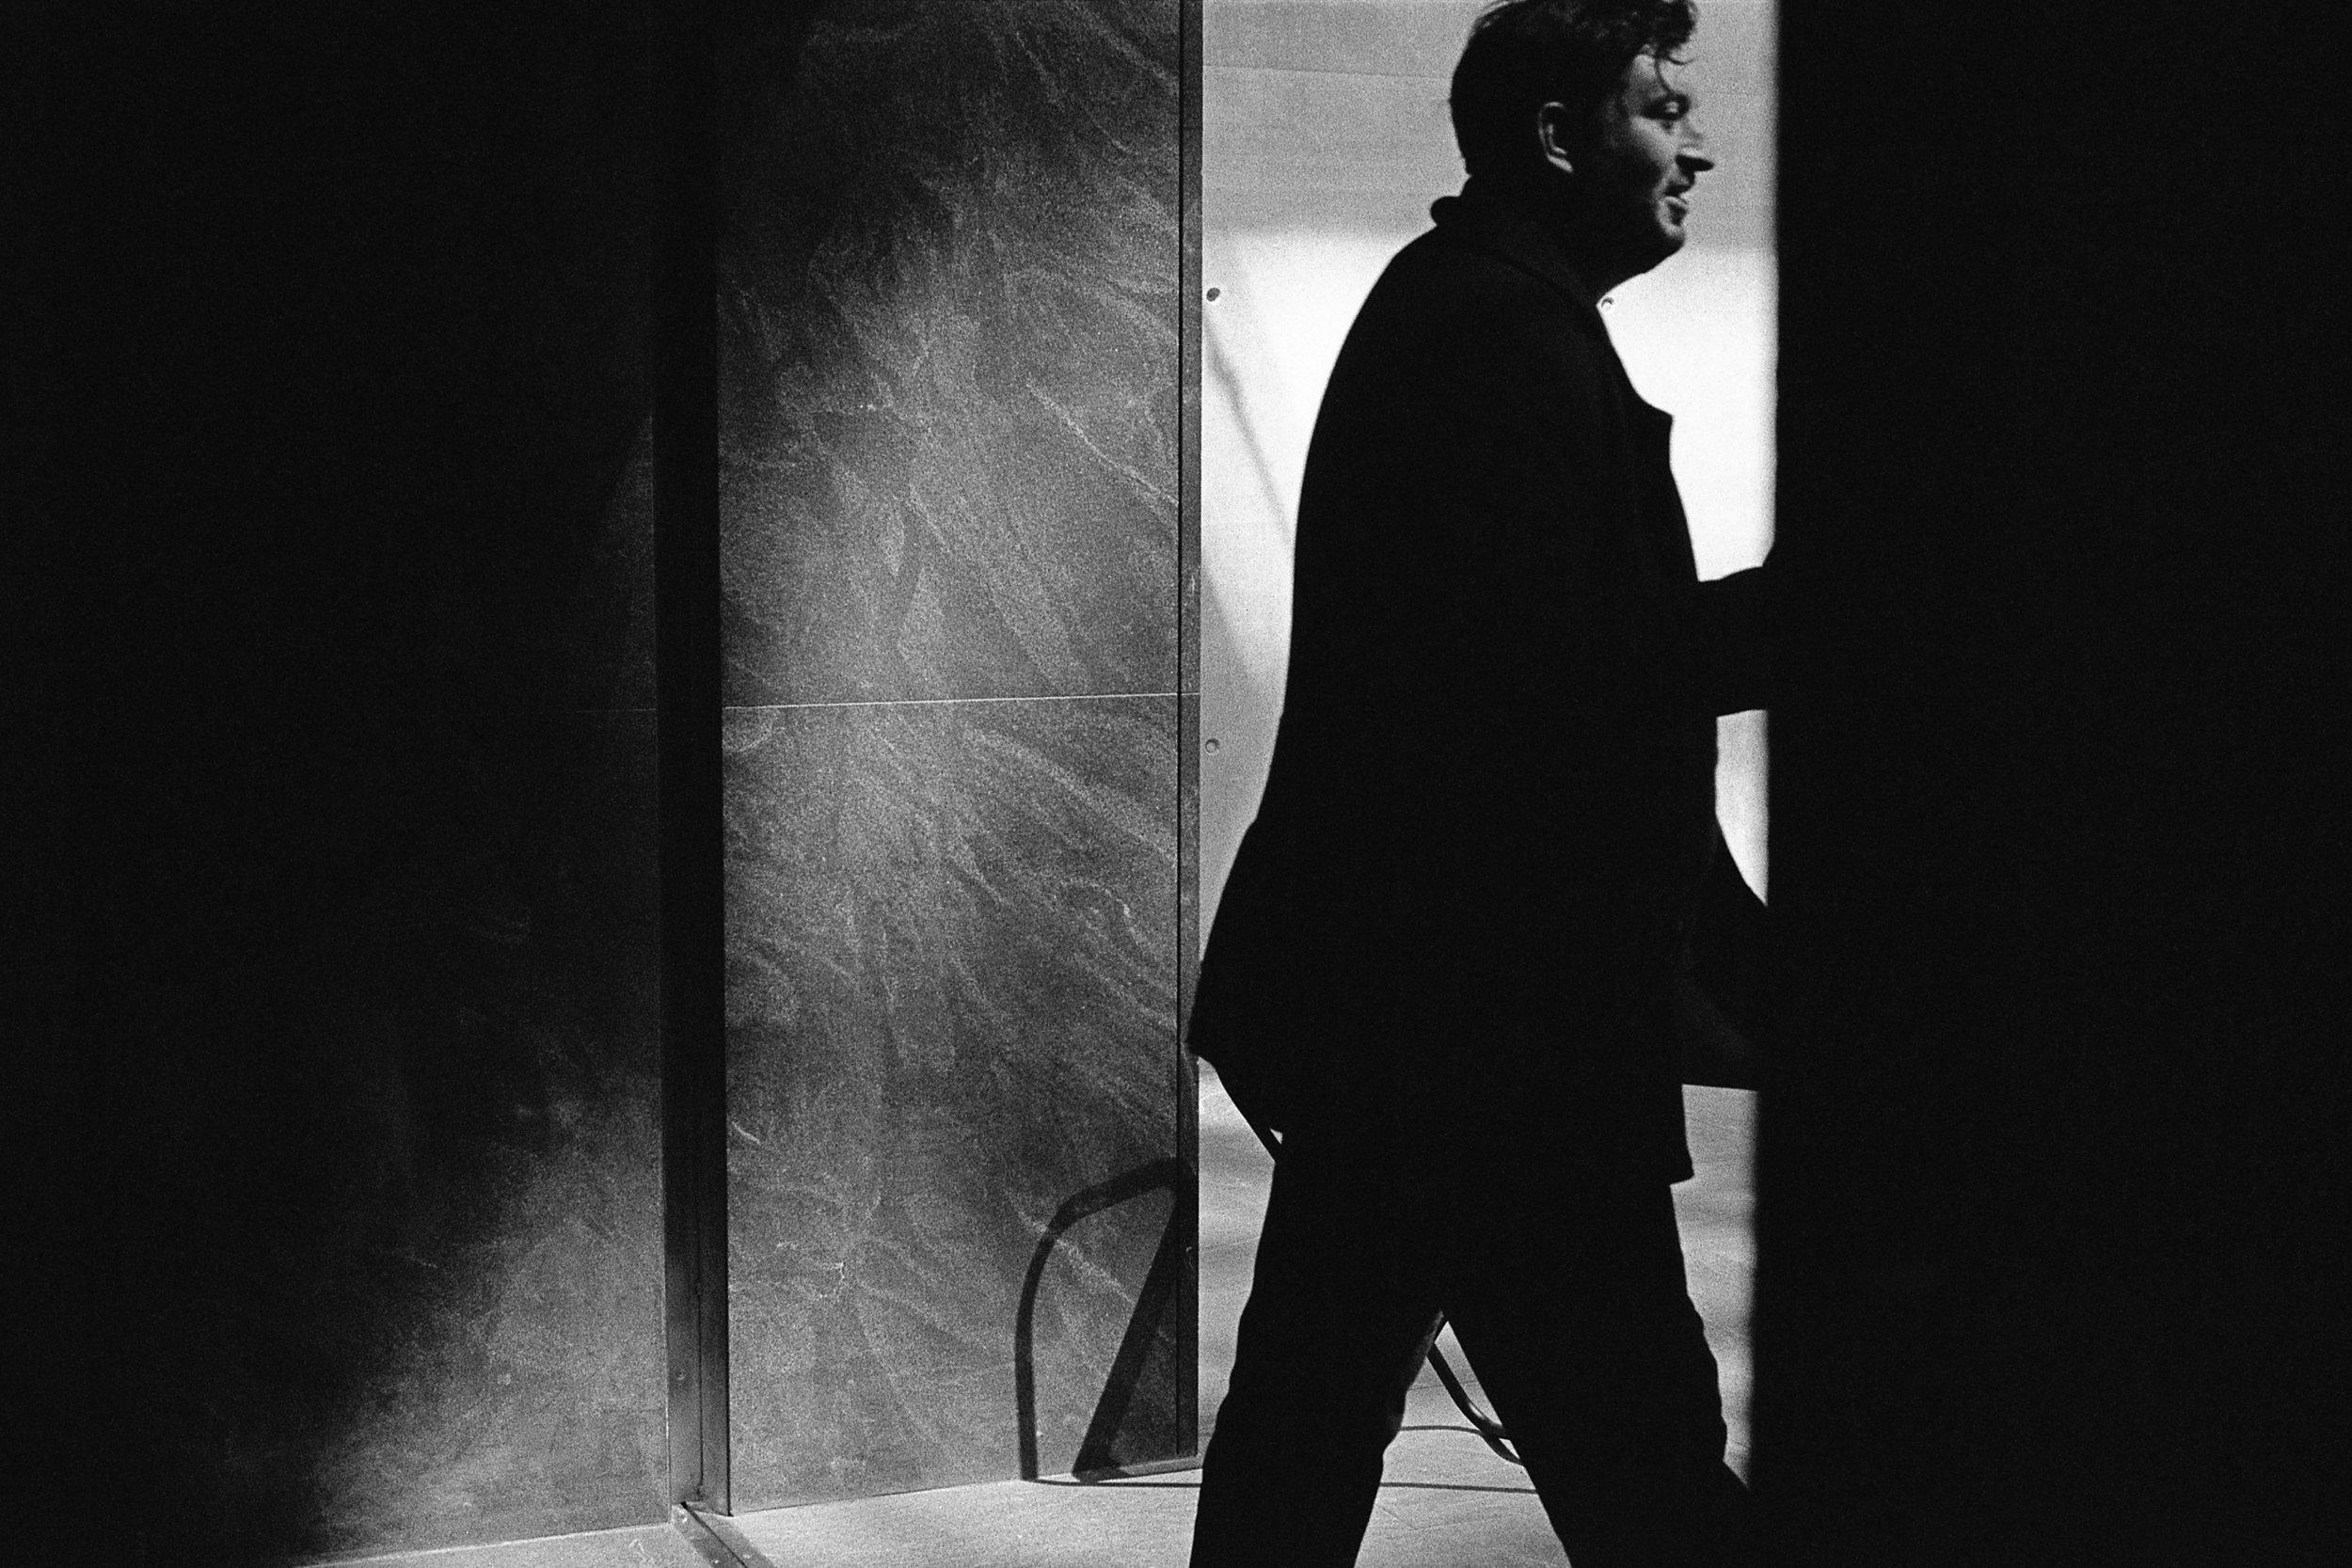 Man Of Darkness.jpg